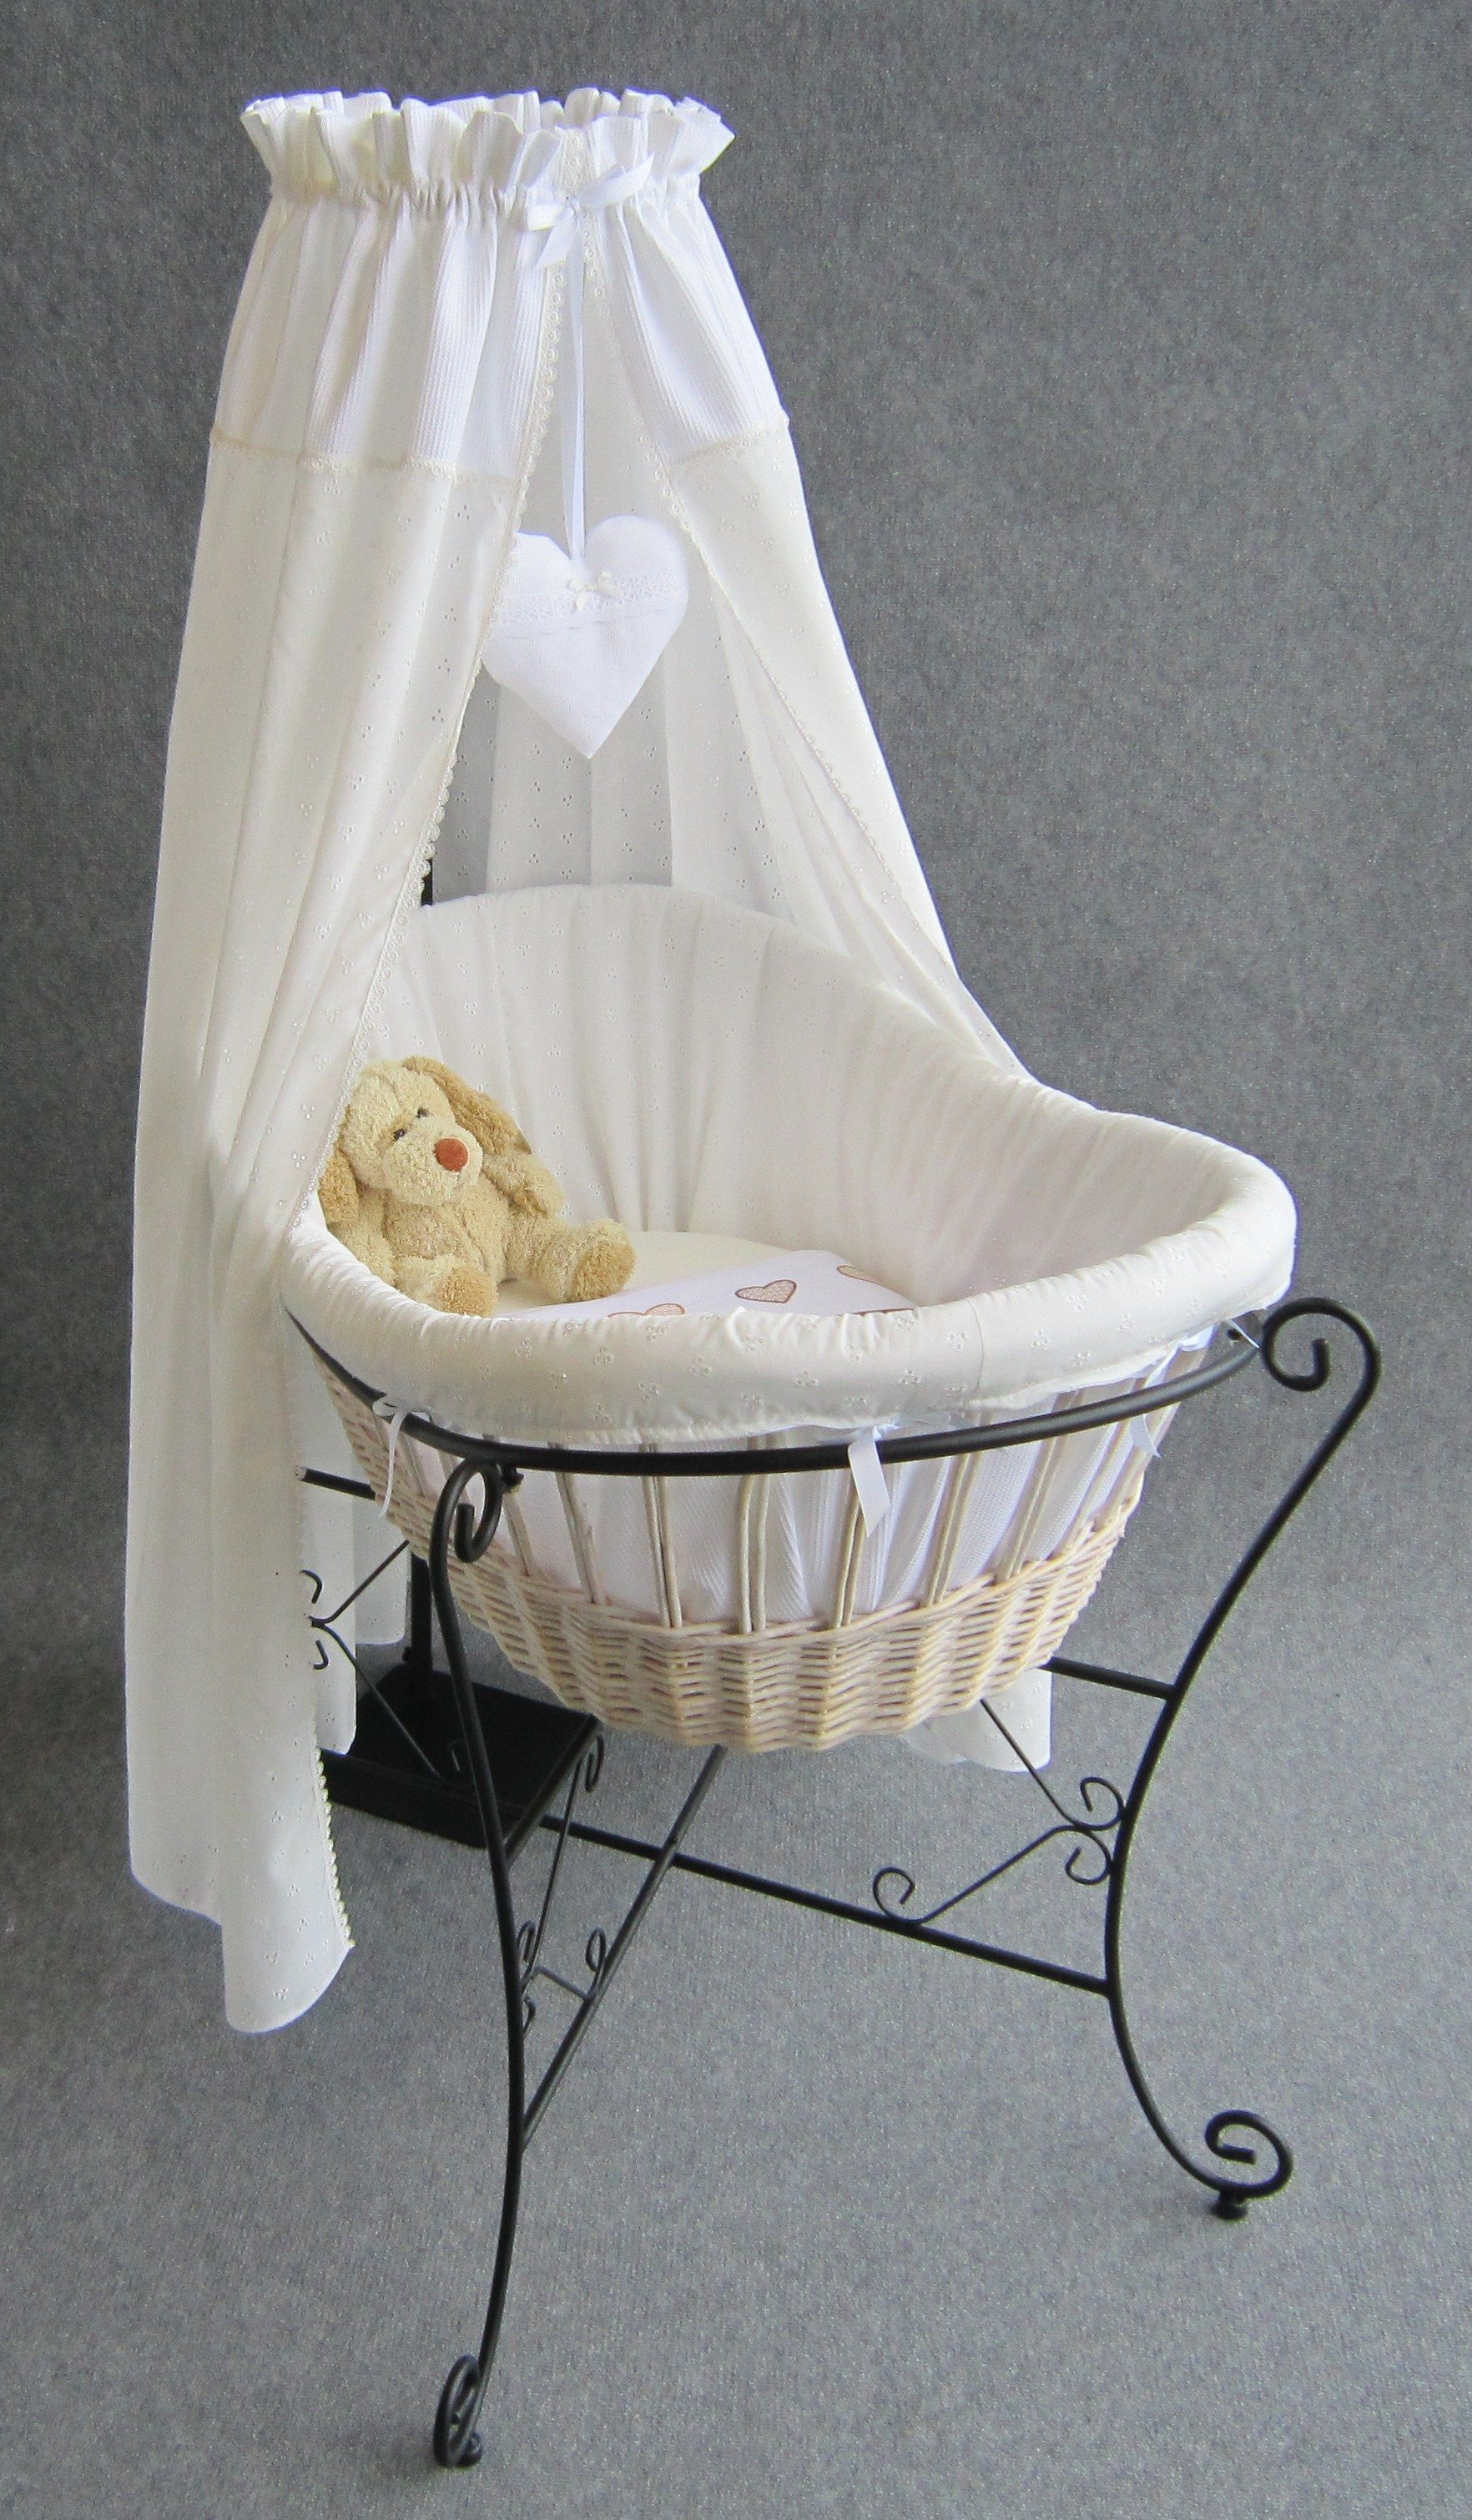 Wieg Creme Broderie By Studio Zanoni Wieg Baby Idee 235 N